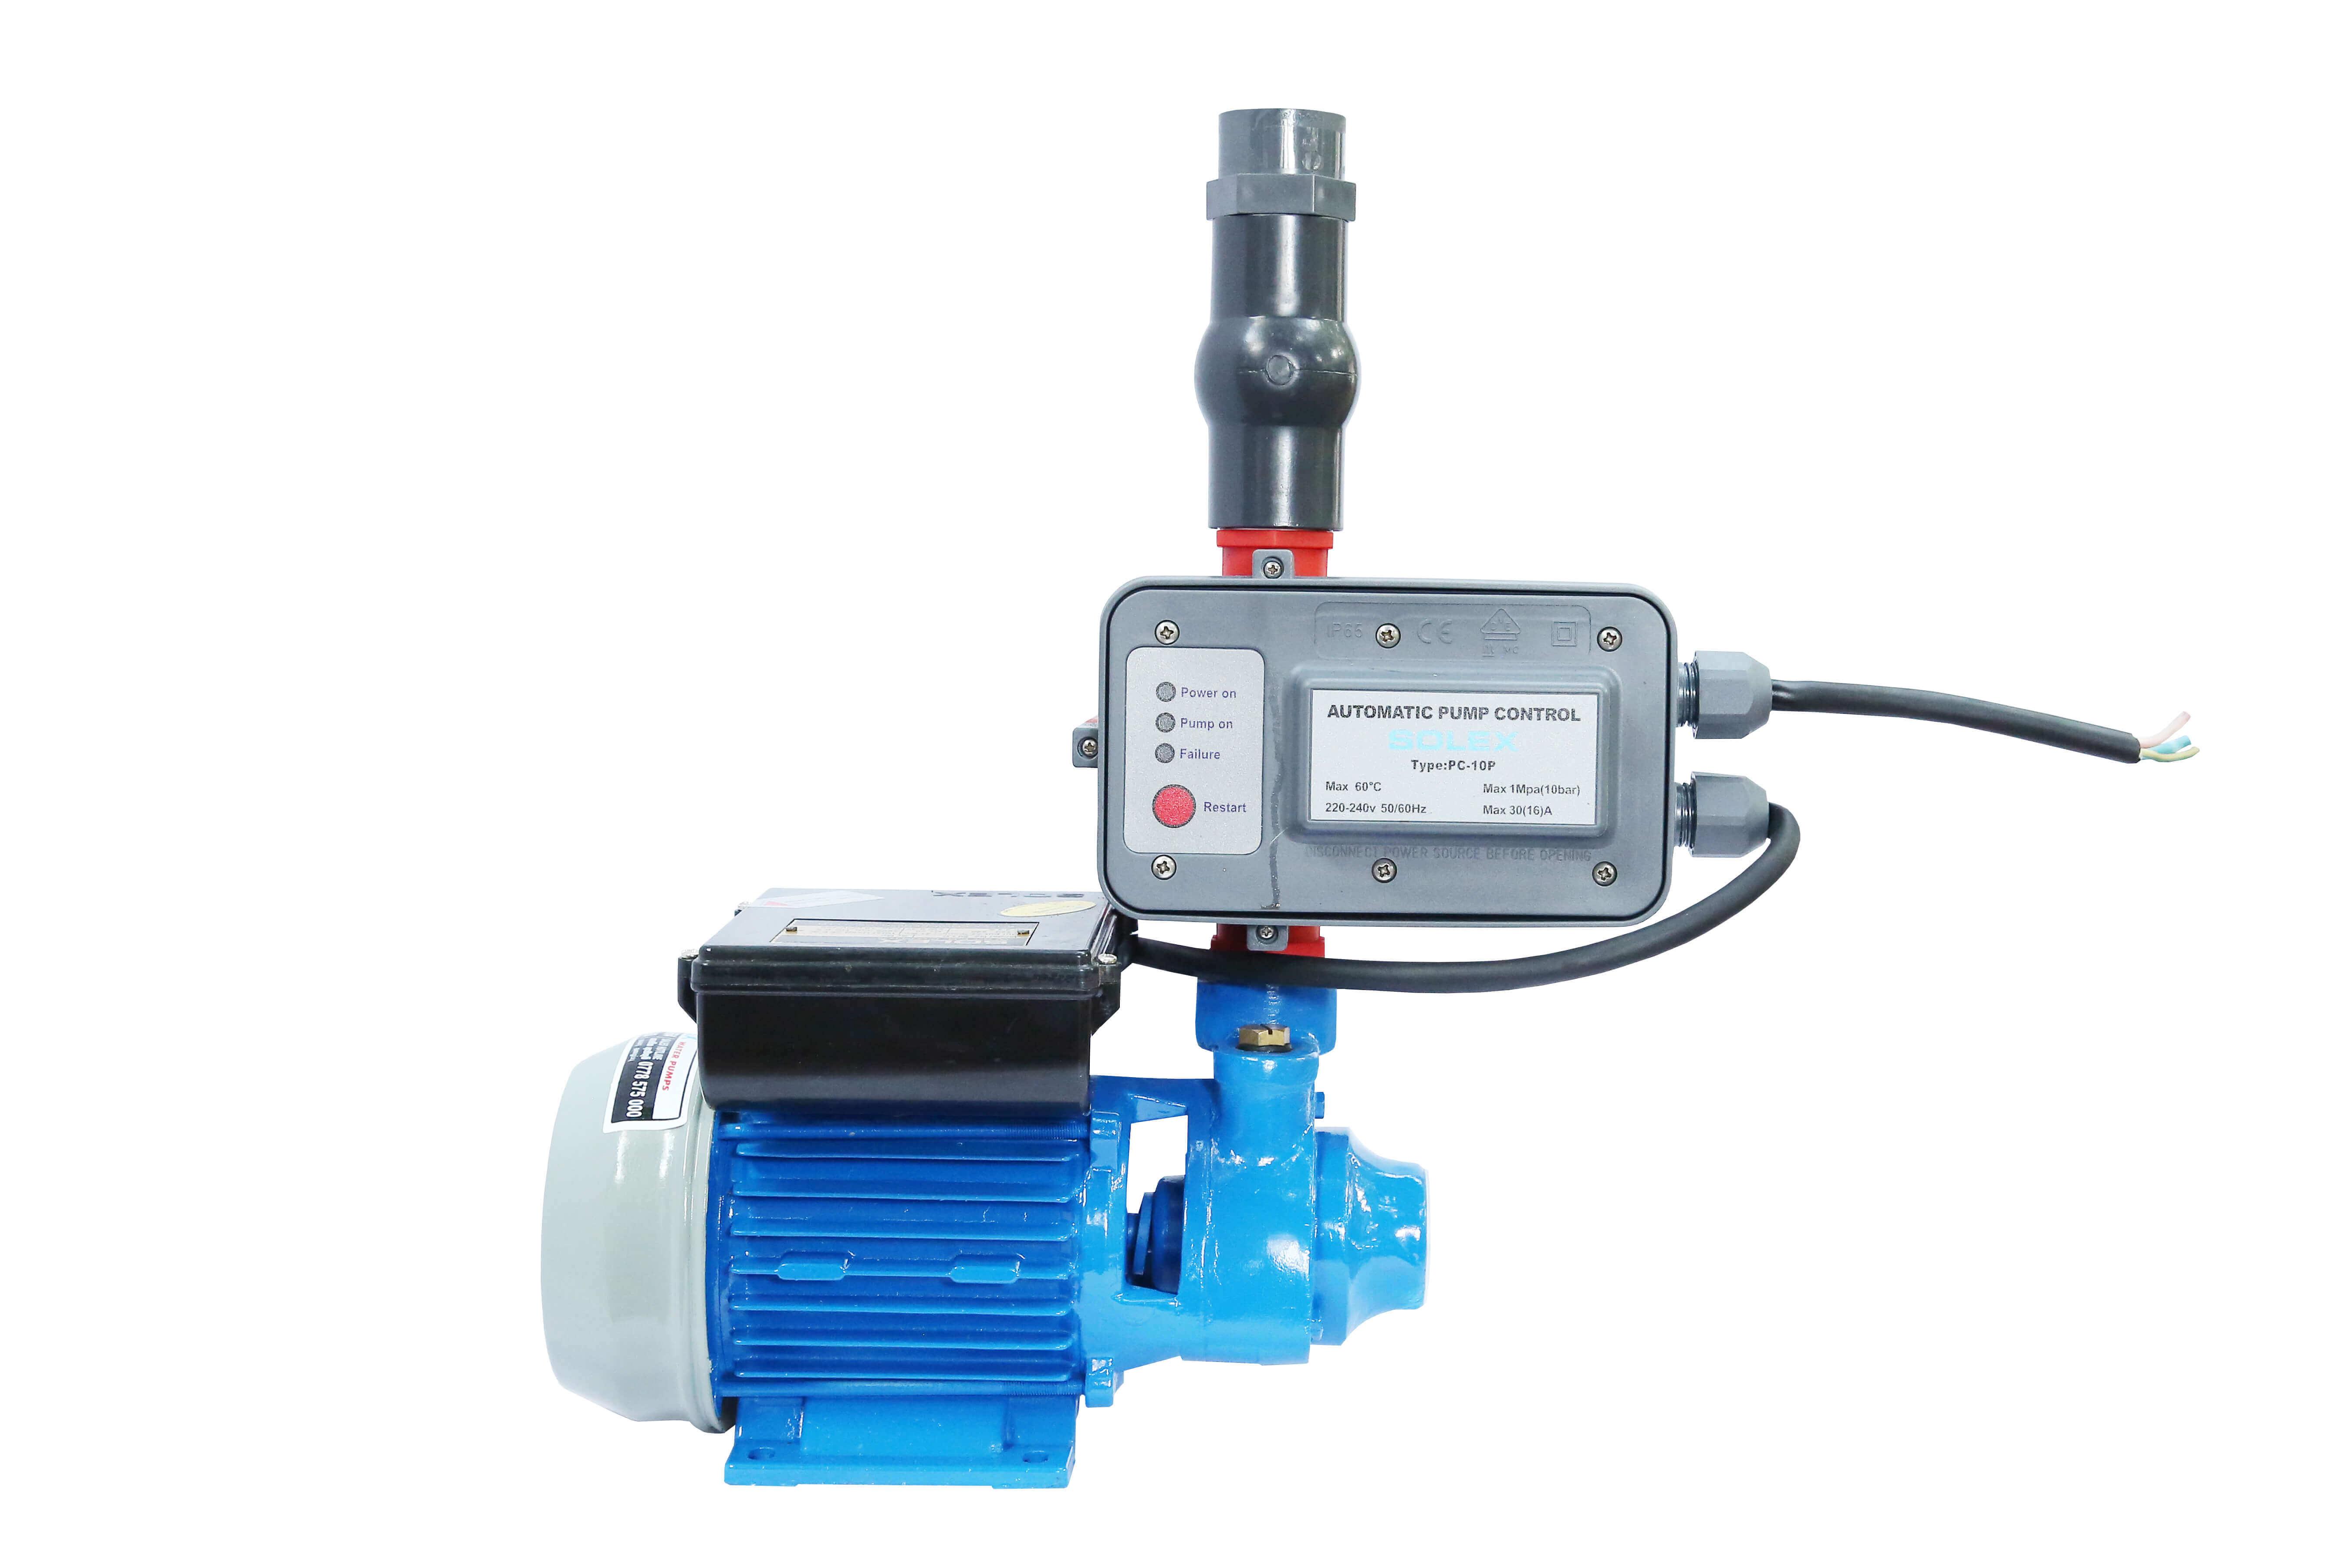 SX 60LD Pump With Pressure Regulator